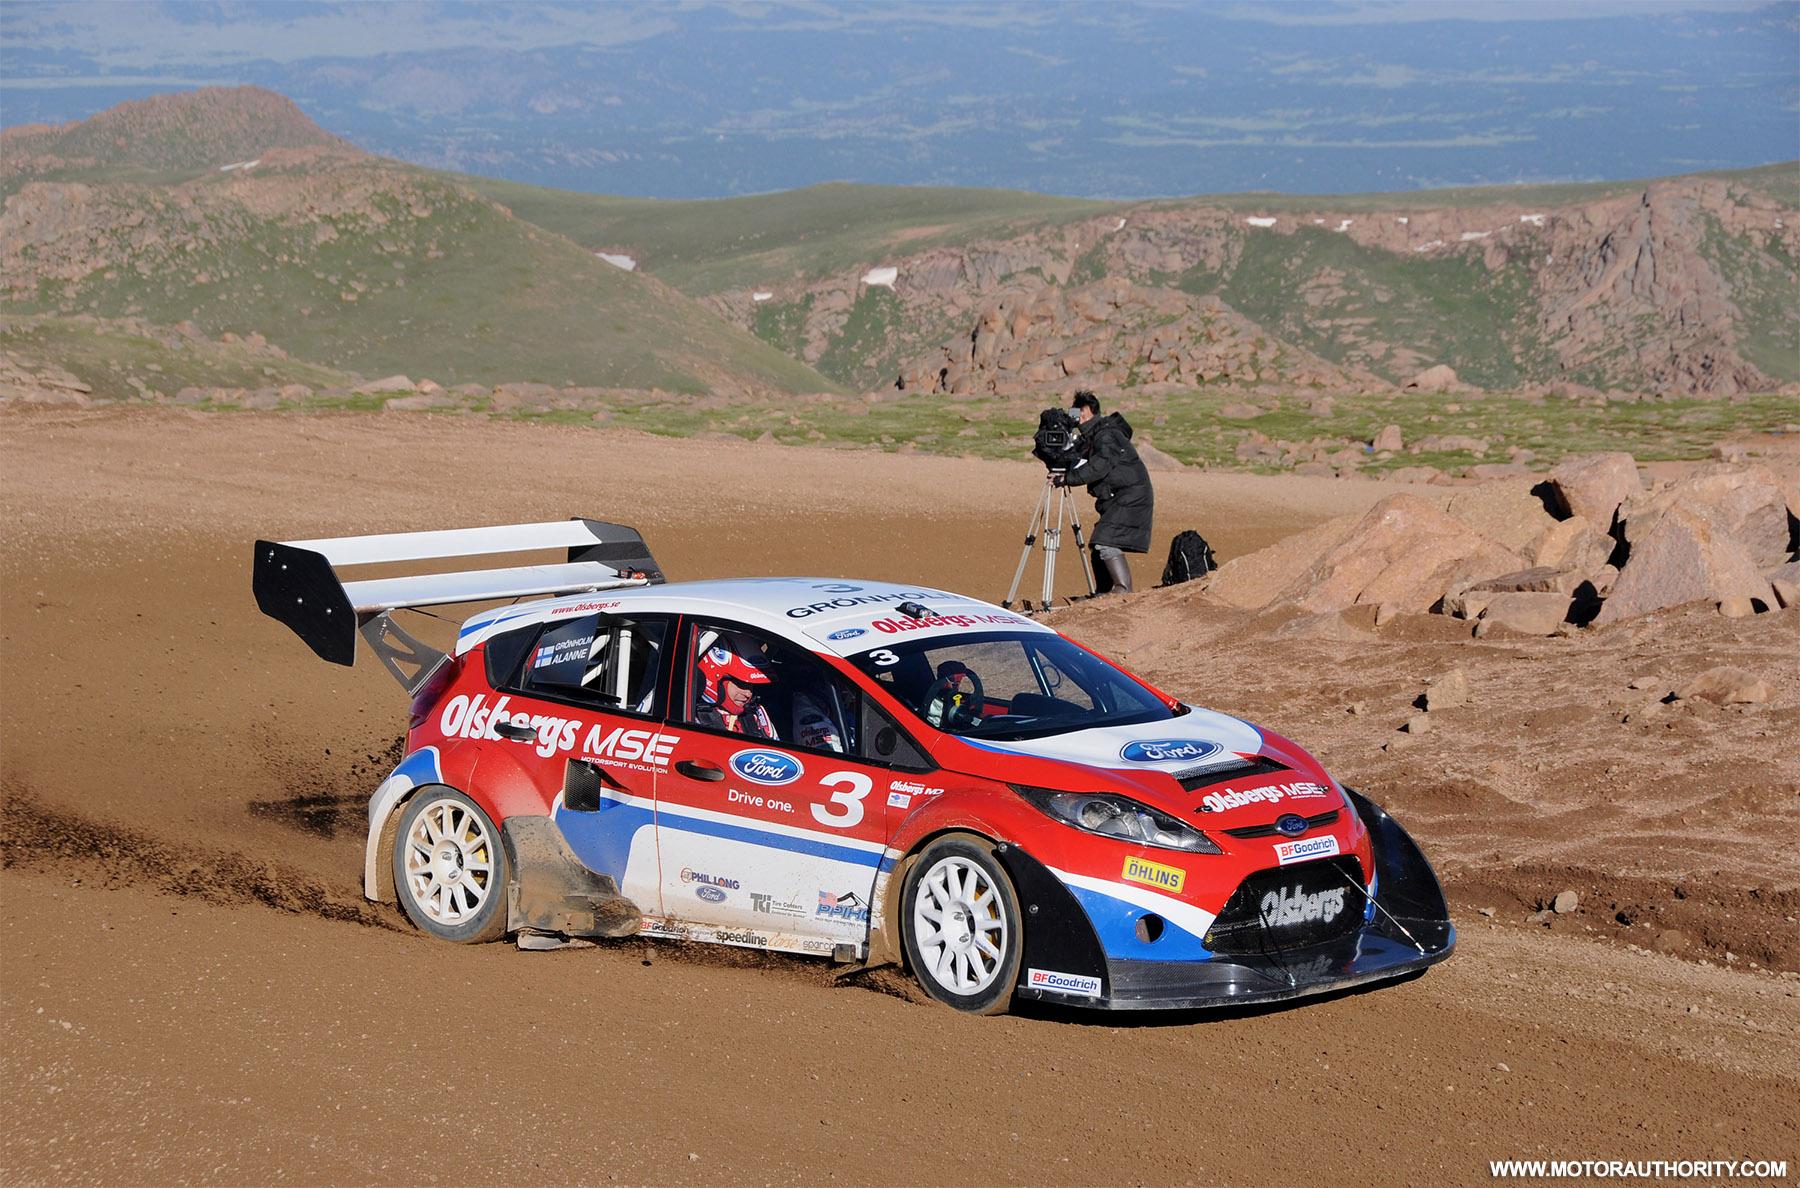 Video Ford Fiesta Rallycross Preps For Pikes Peak Hill Climb